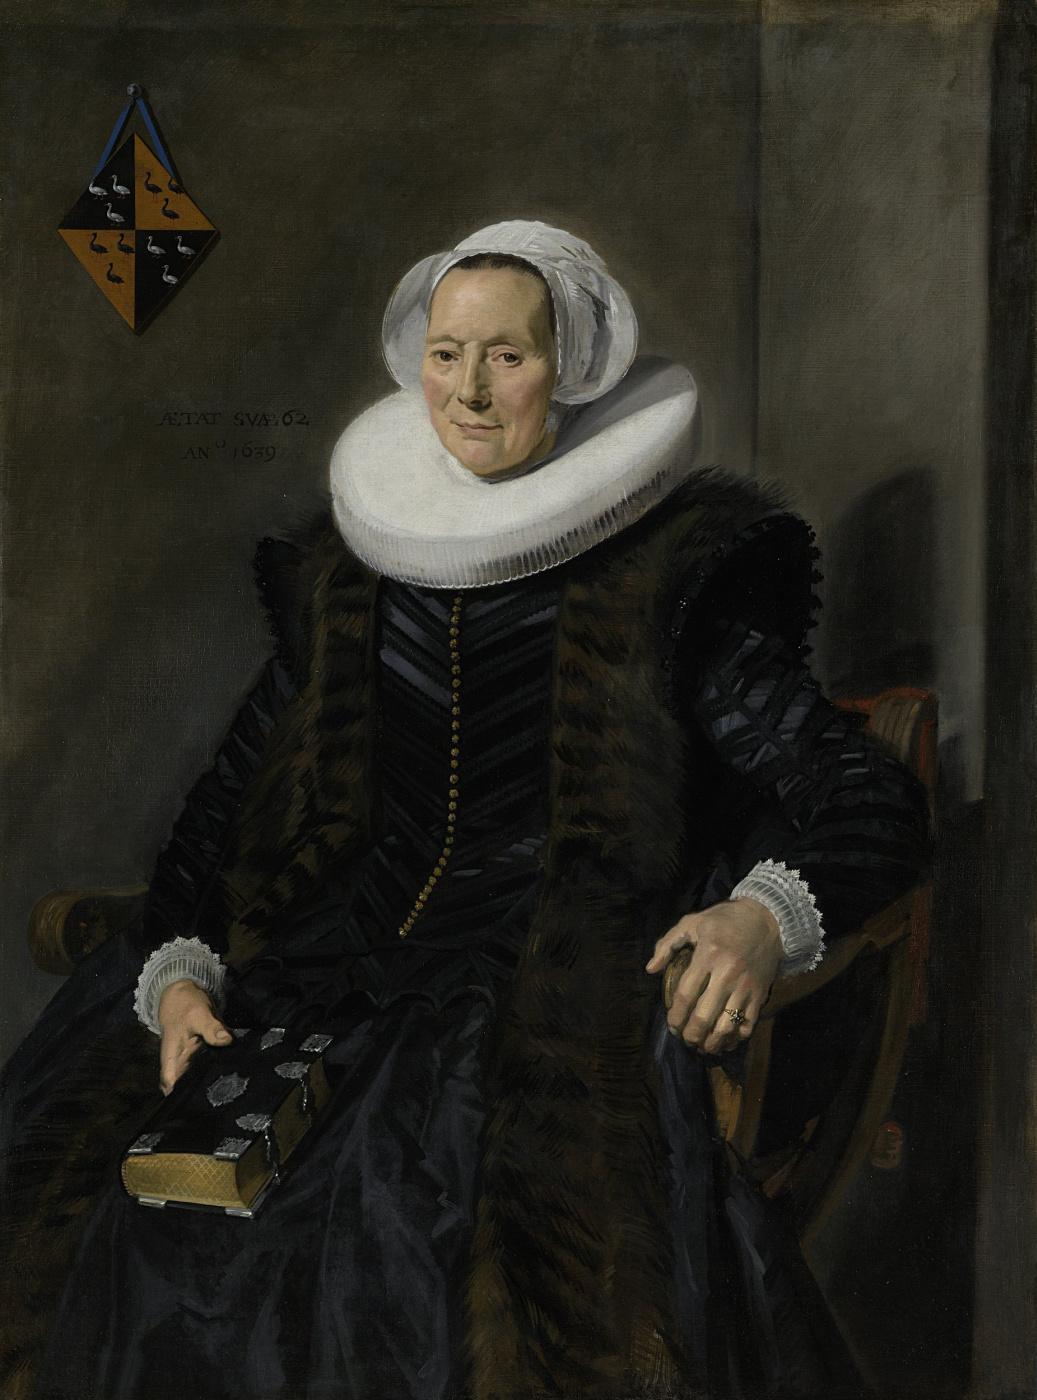 Frans Hals. Portrait of Marit Vogt, wife of Peter Alikana, the mayor of Harlem